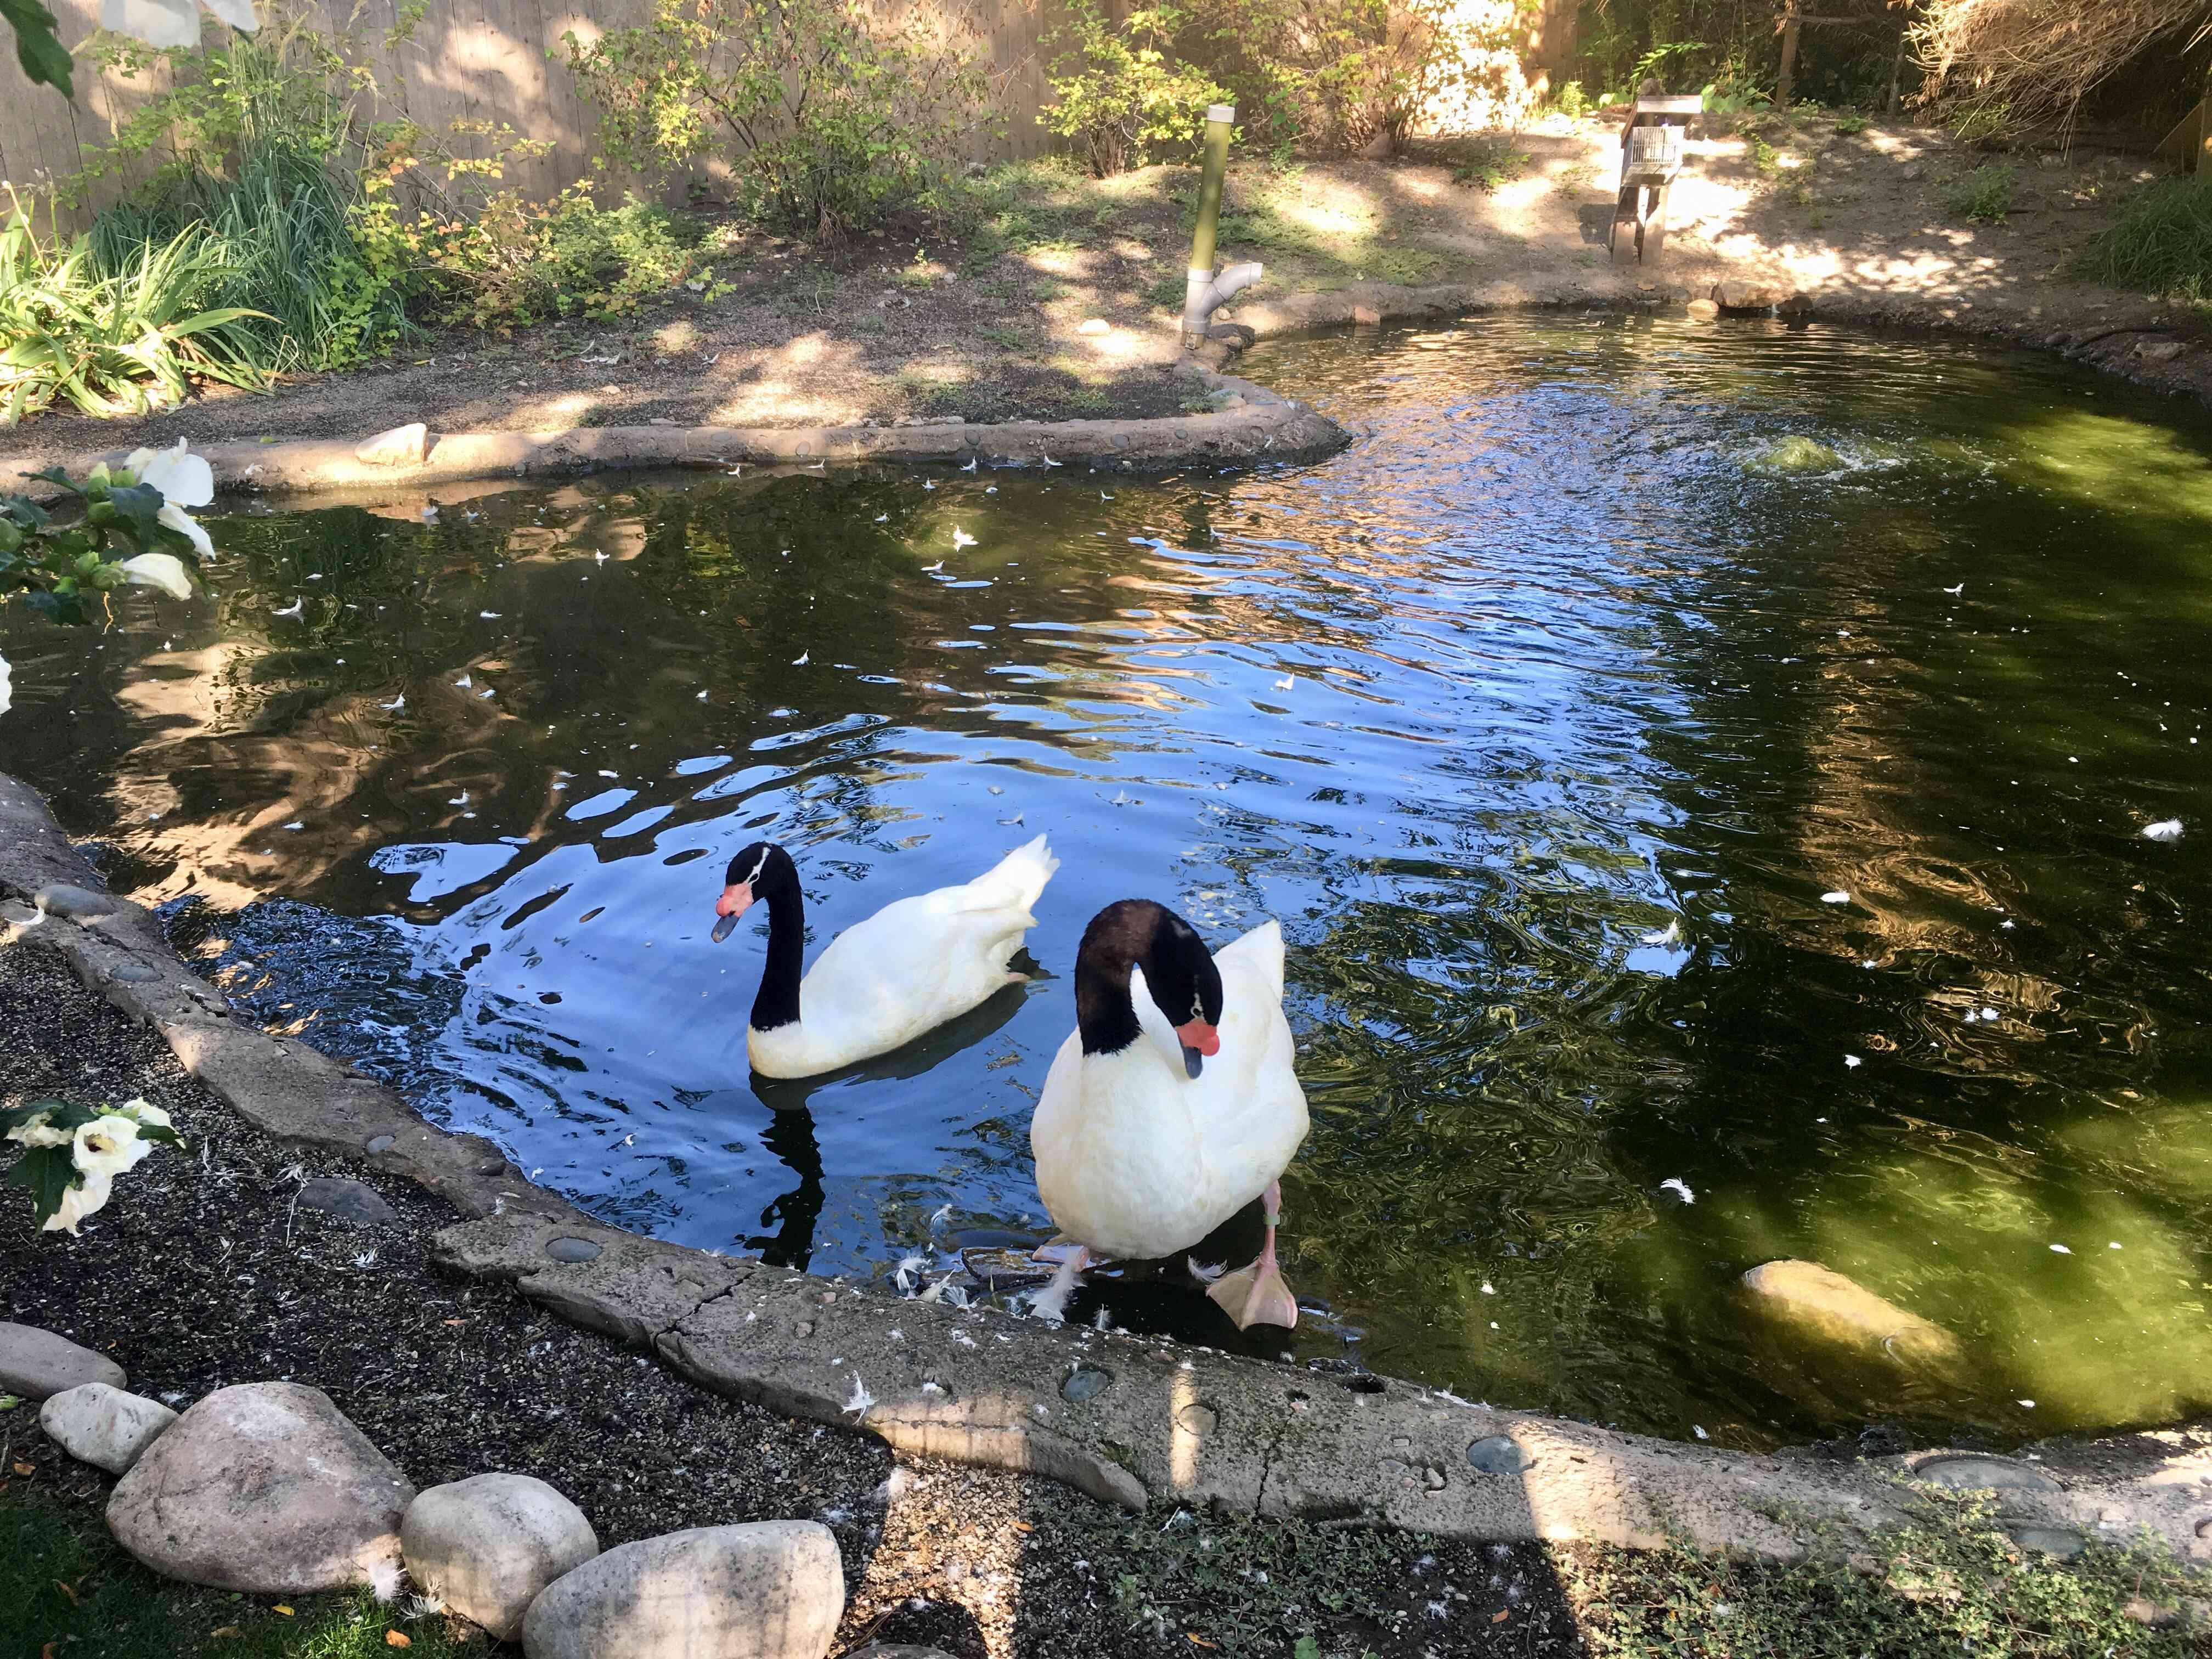 Black Necked Swan (Cygnus melancoryphus)